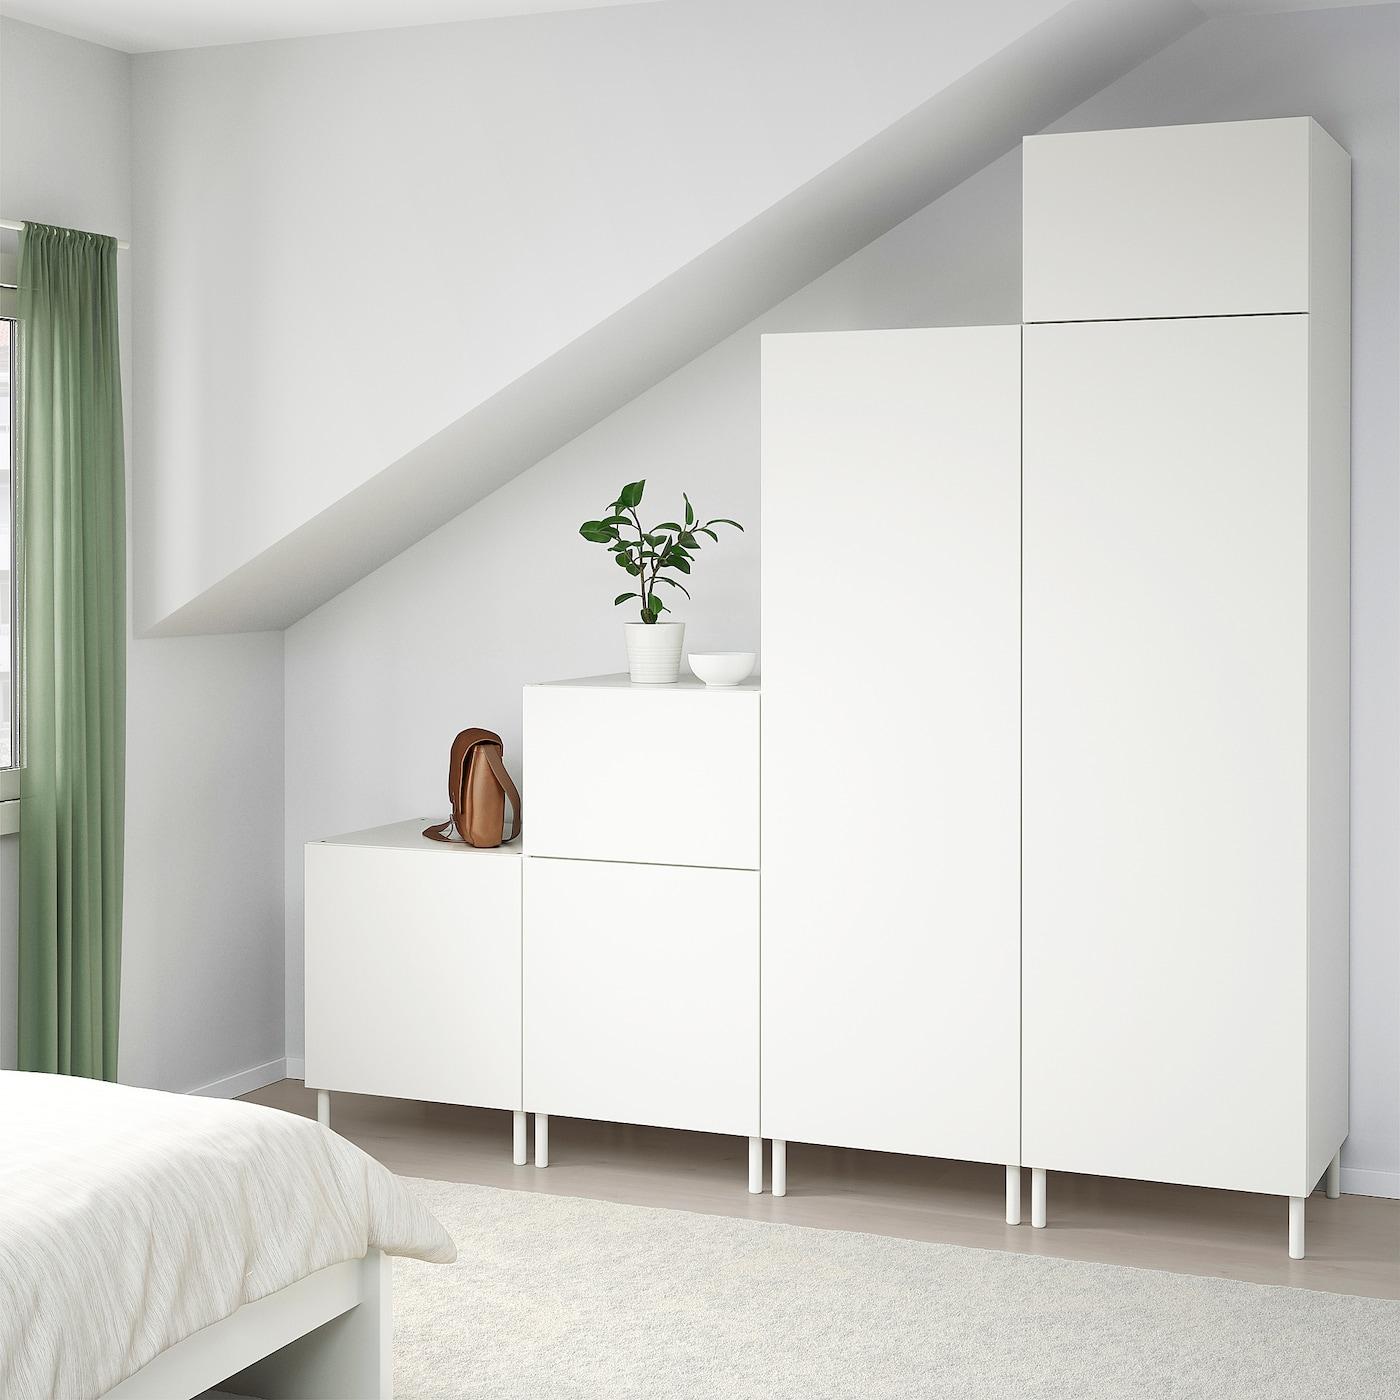 PLATSA Garderob, vit/Fonnes vit, 240x57x231 cm